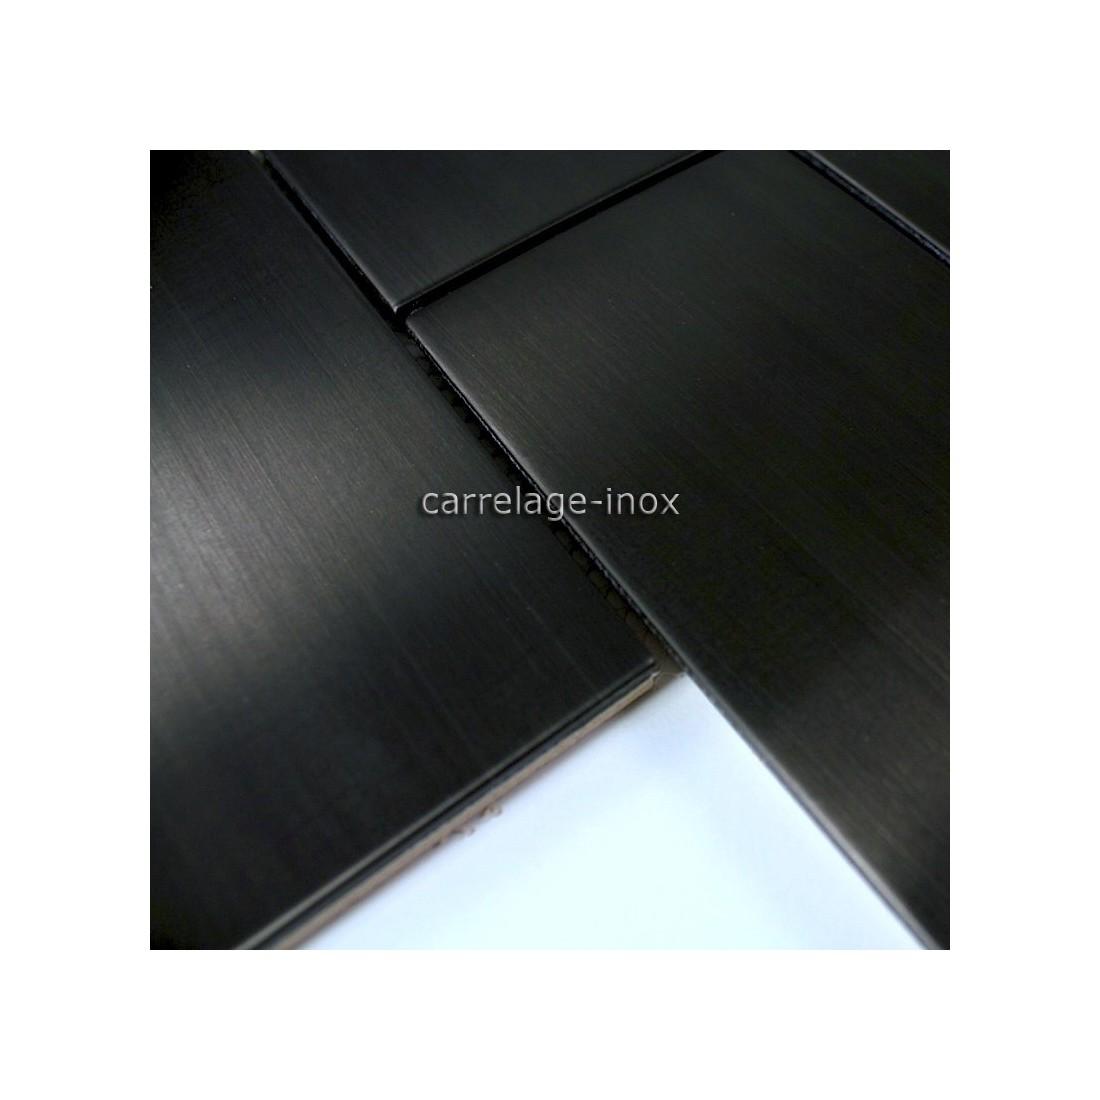 Carrelage mosaique inox bross noir cuisine brique150 noir - Carrelage cuisine noir ...